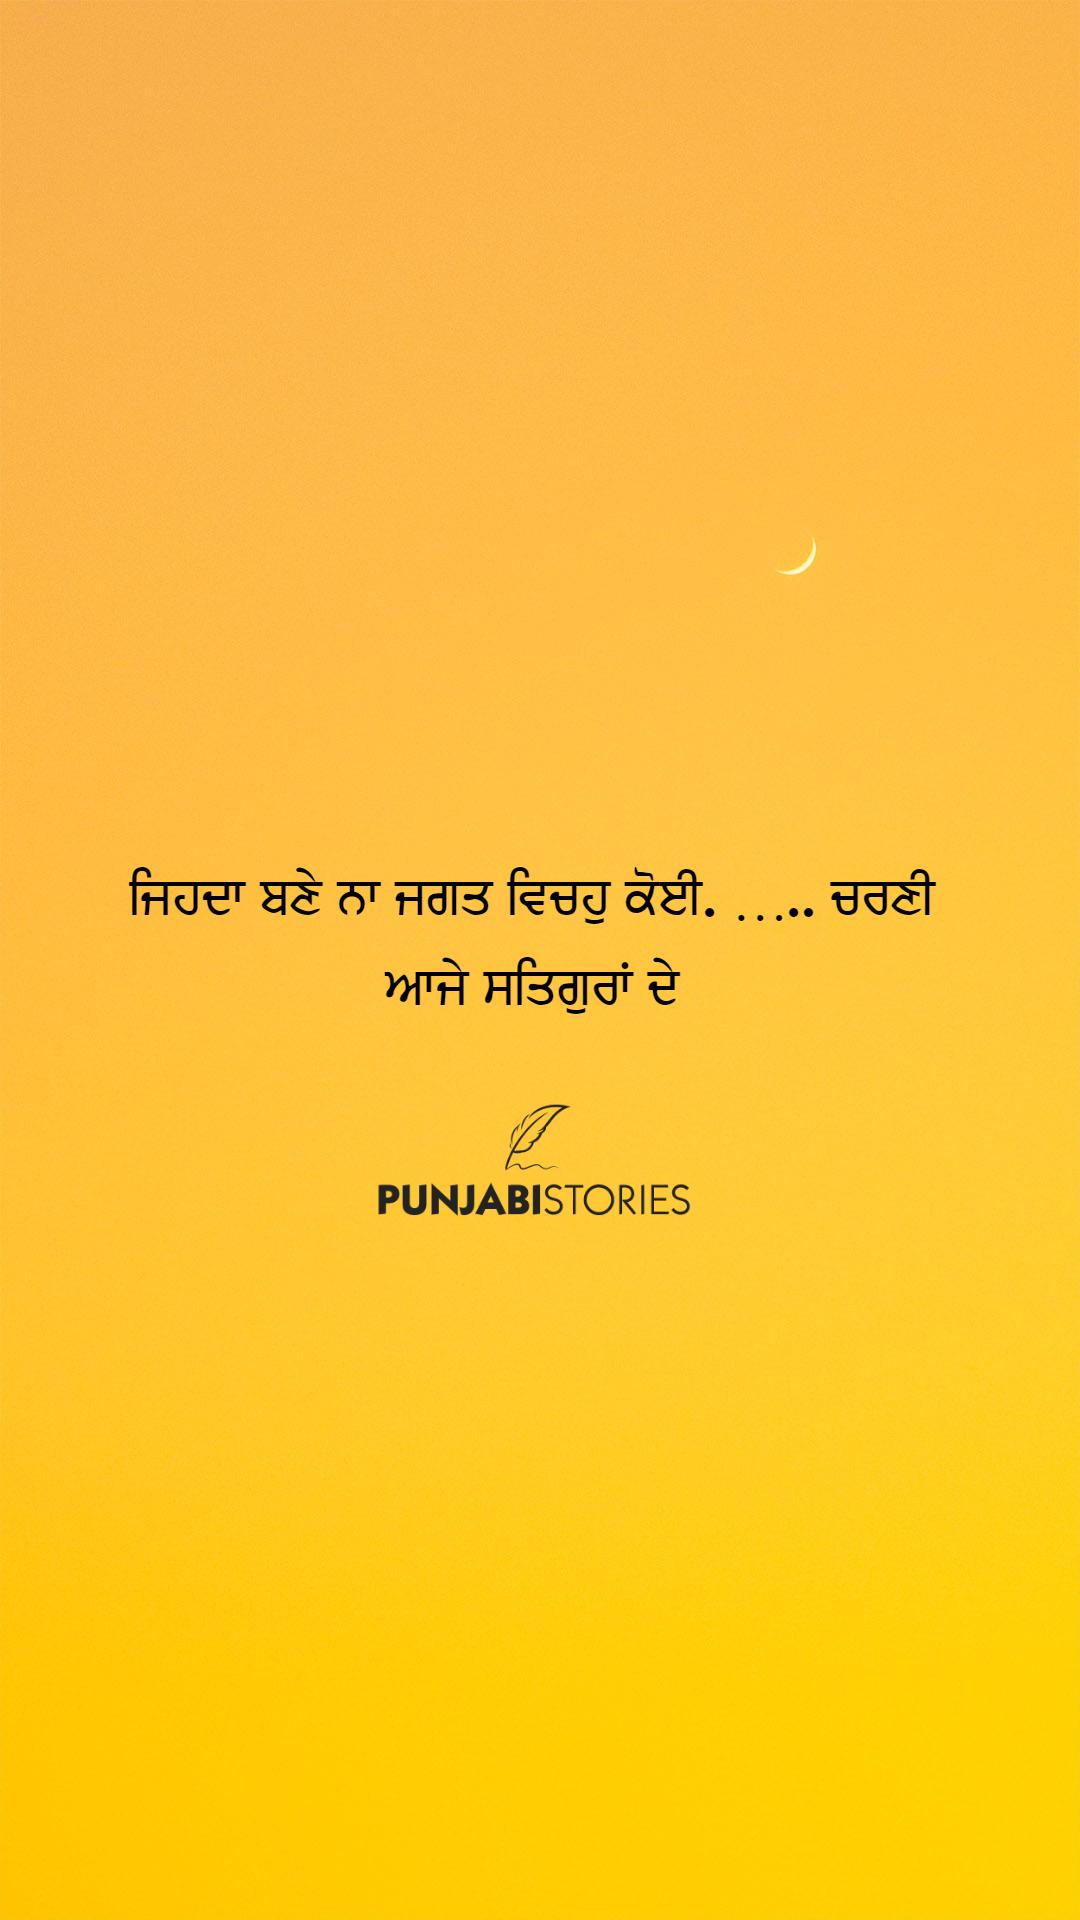 Punjabi Status for Whatsapp FaceBook, Dharmik Status in Punjabi